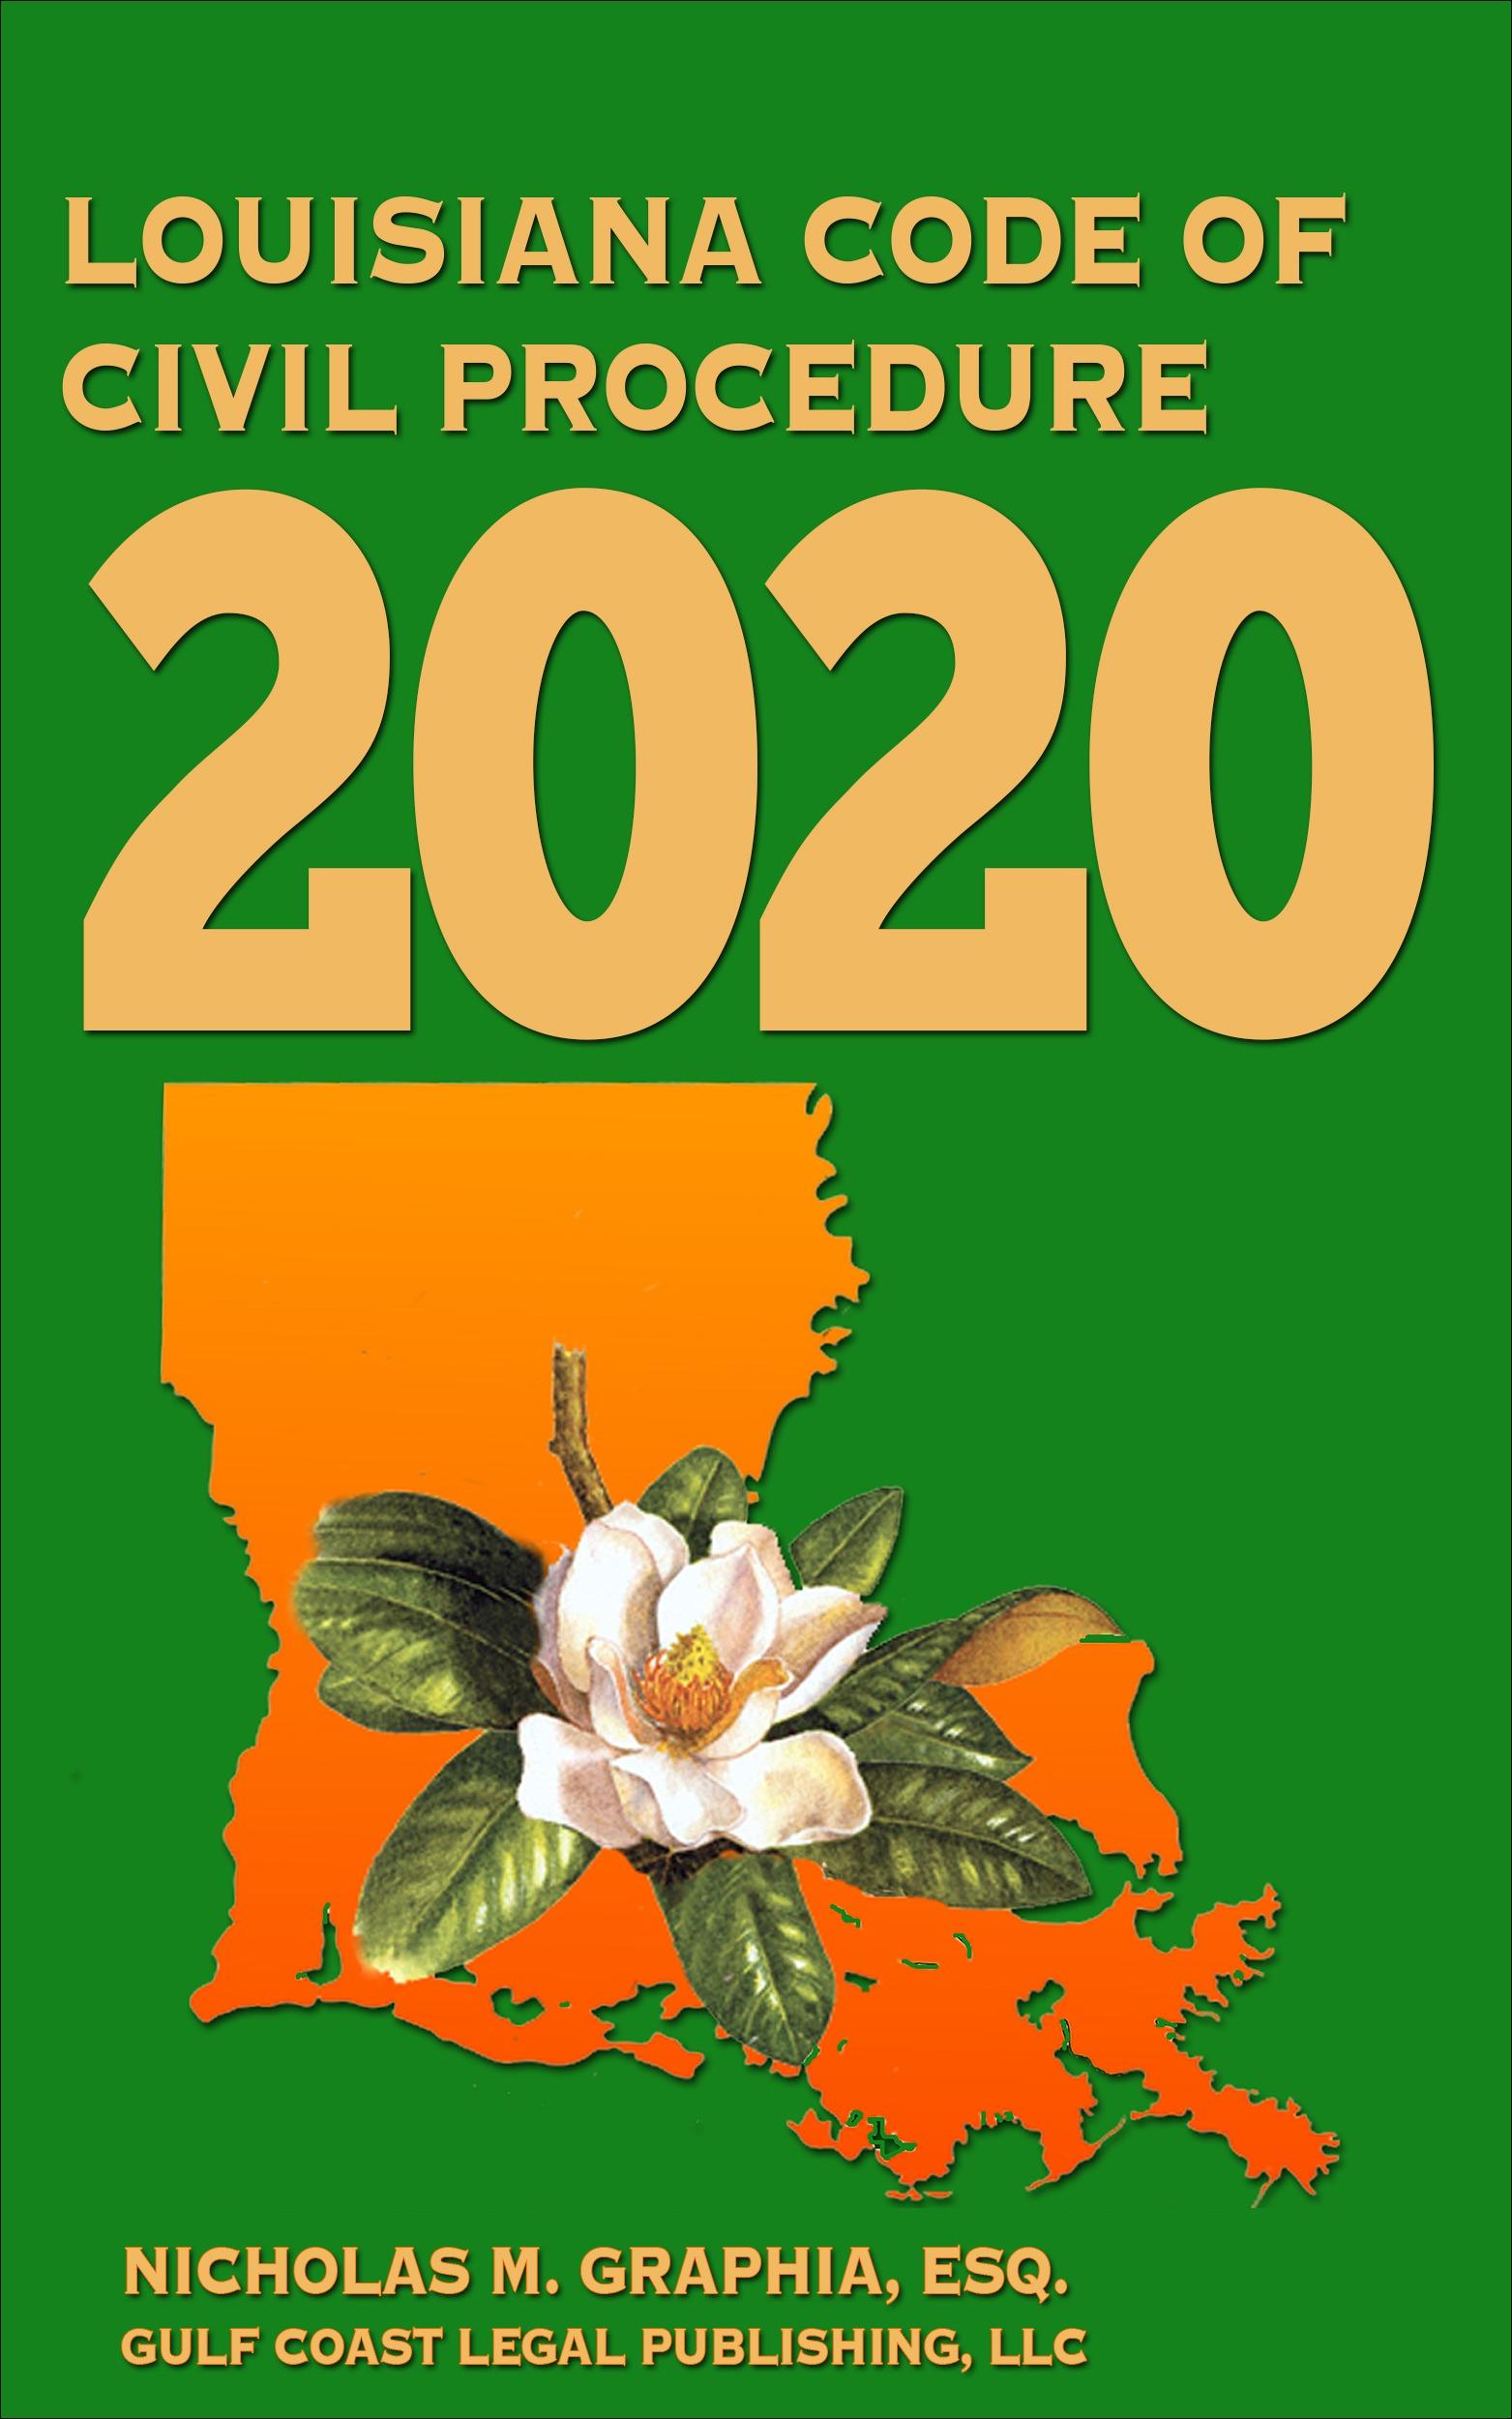 2020LouisianaCodeofCivilProcedure.eBookCover